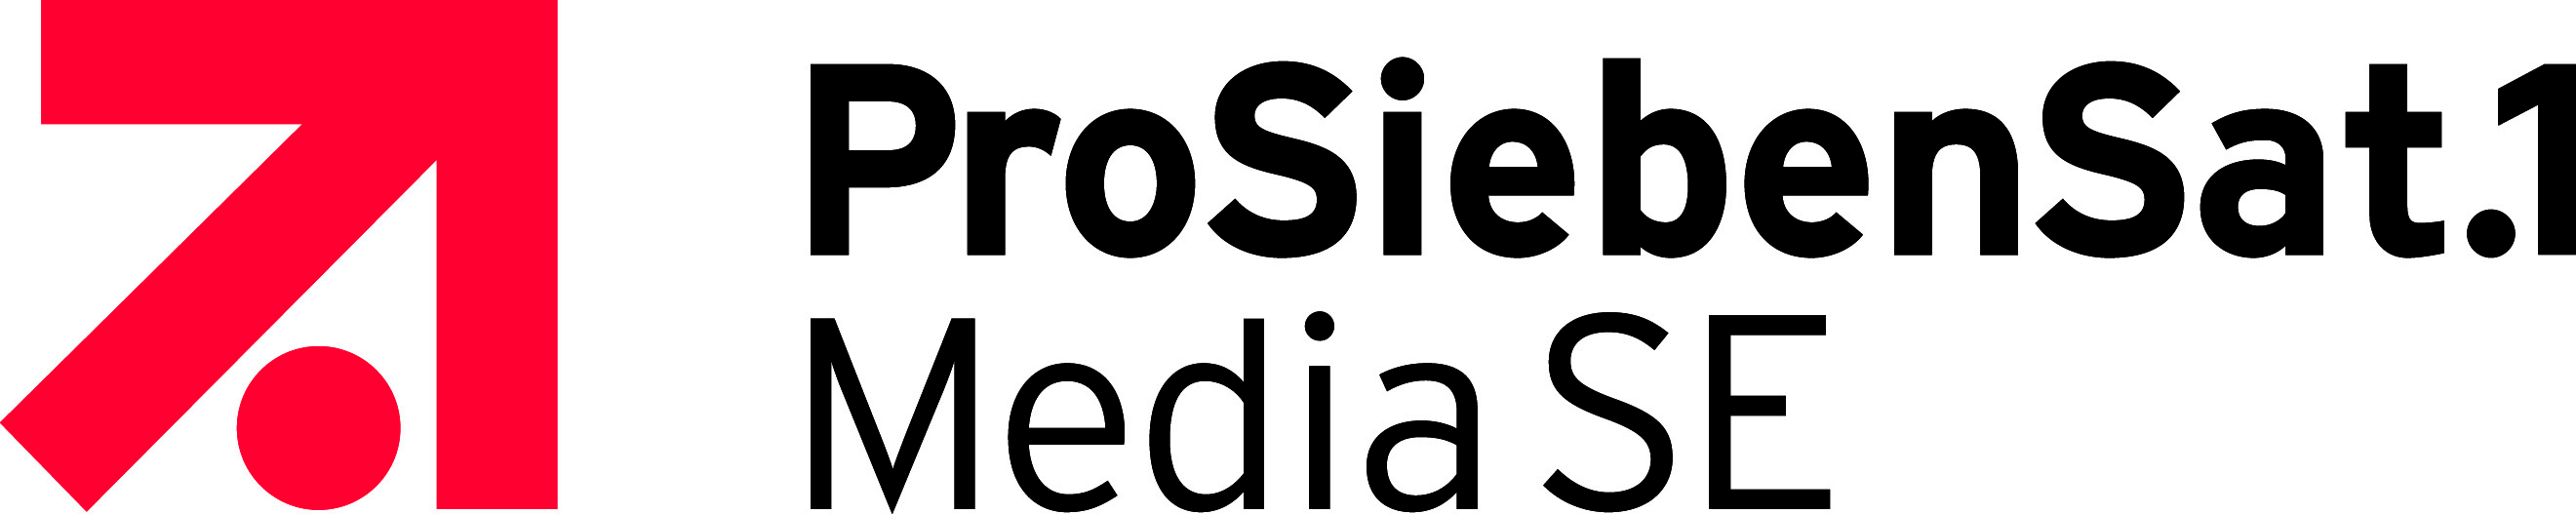 P7S1 Logo